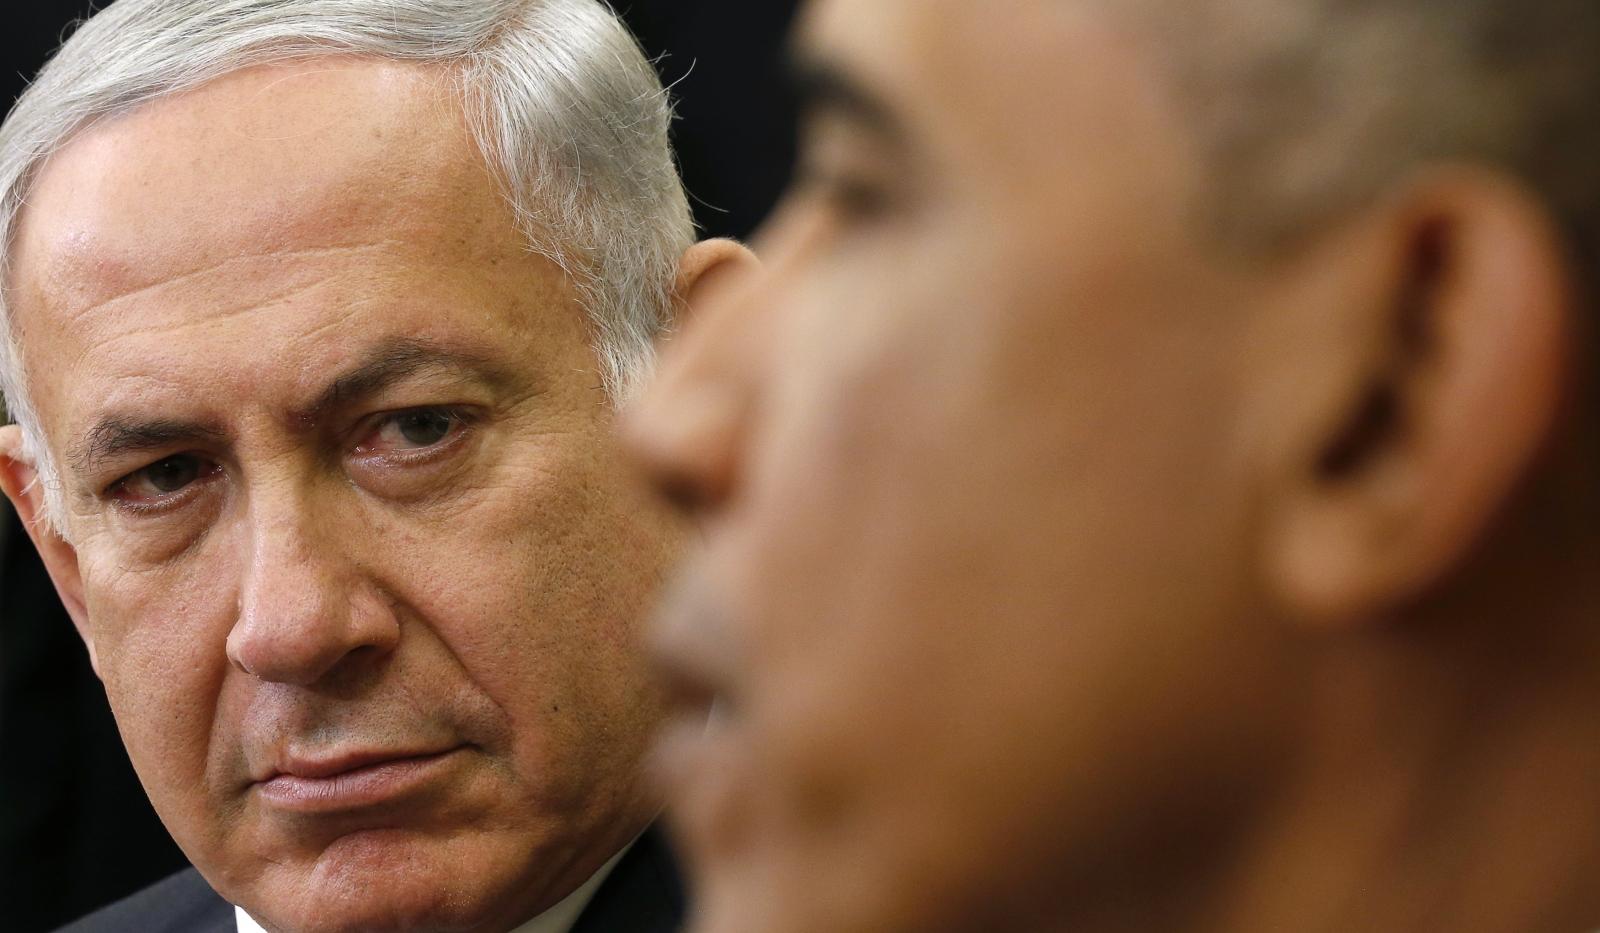 Netanyahu speech: Does Bibi face oblivion if Congress gamble